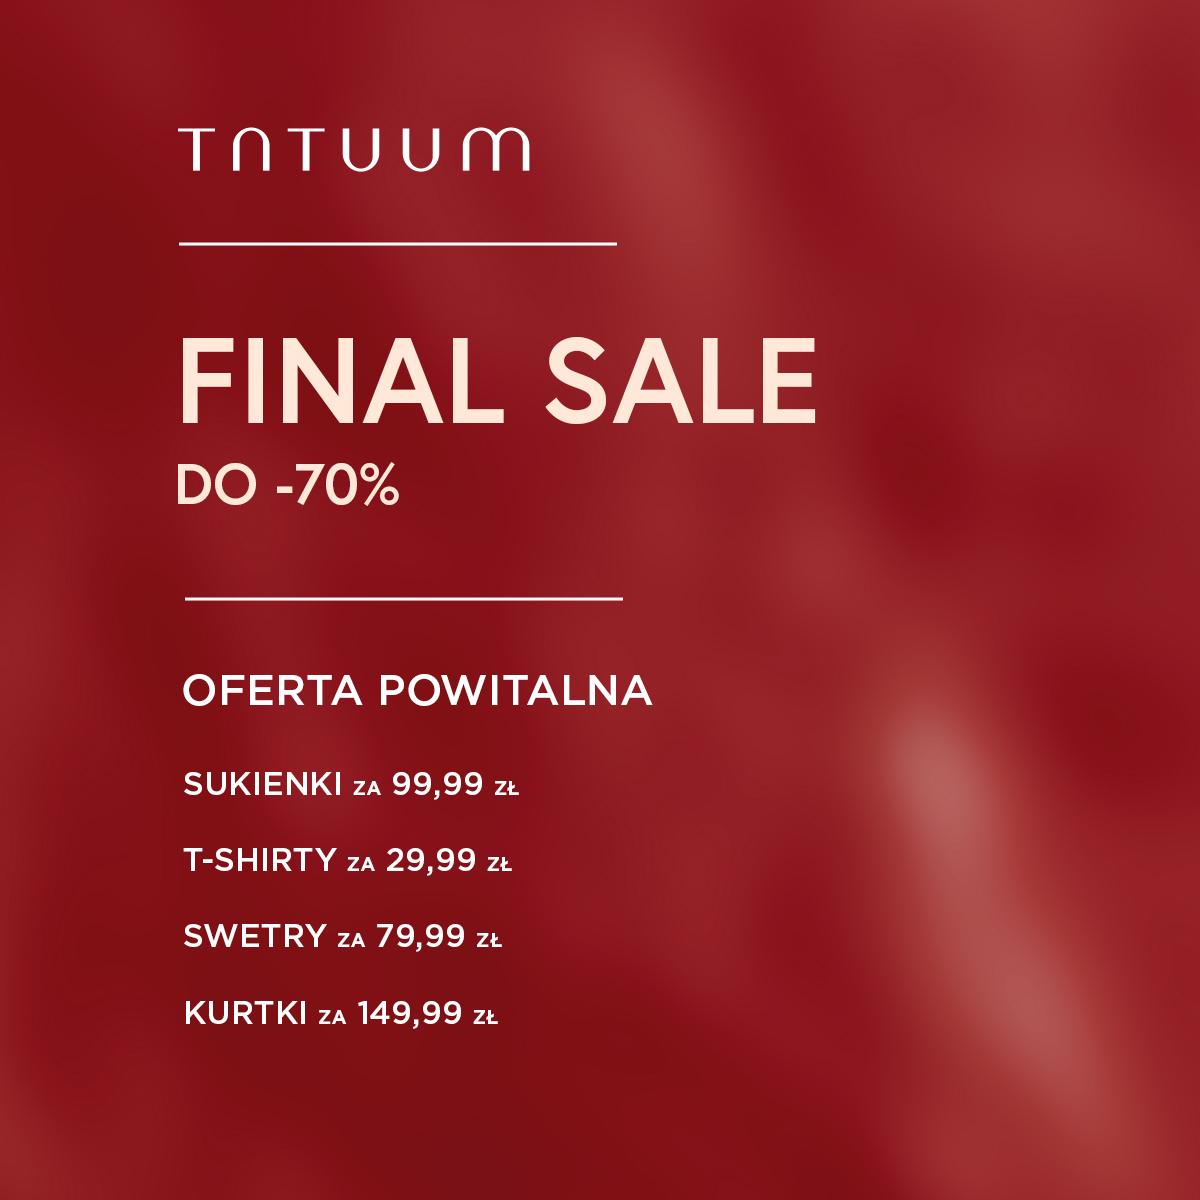 Sklep Tatuum w Tkalni